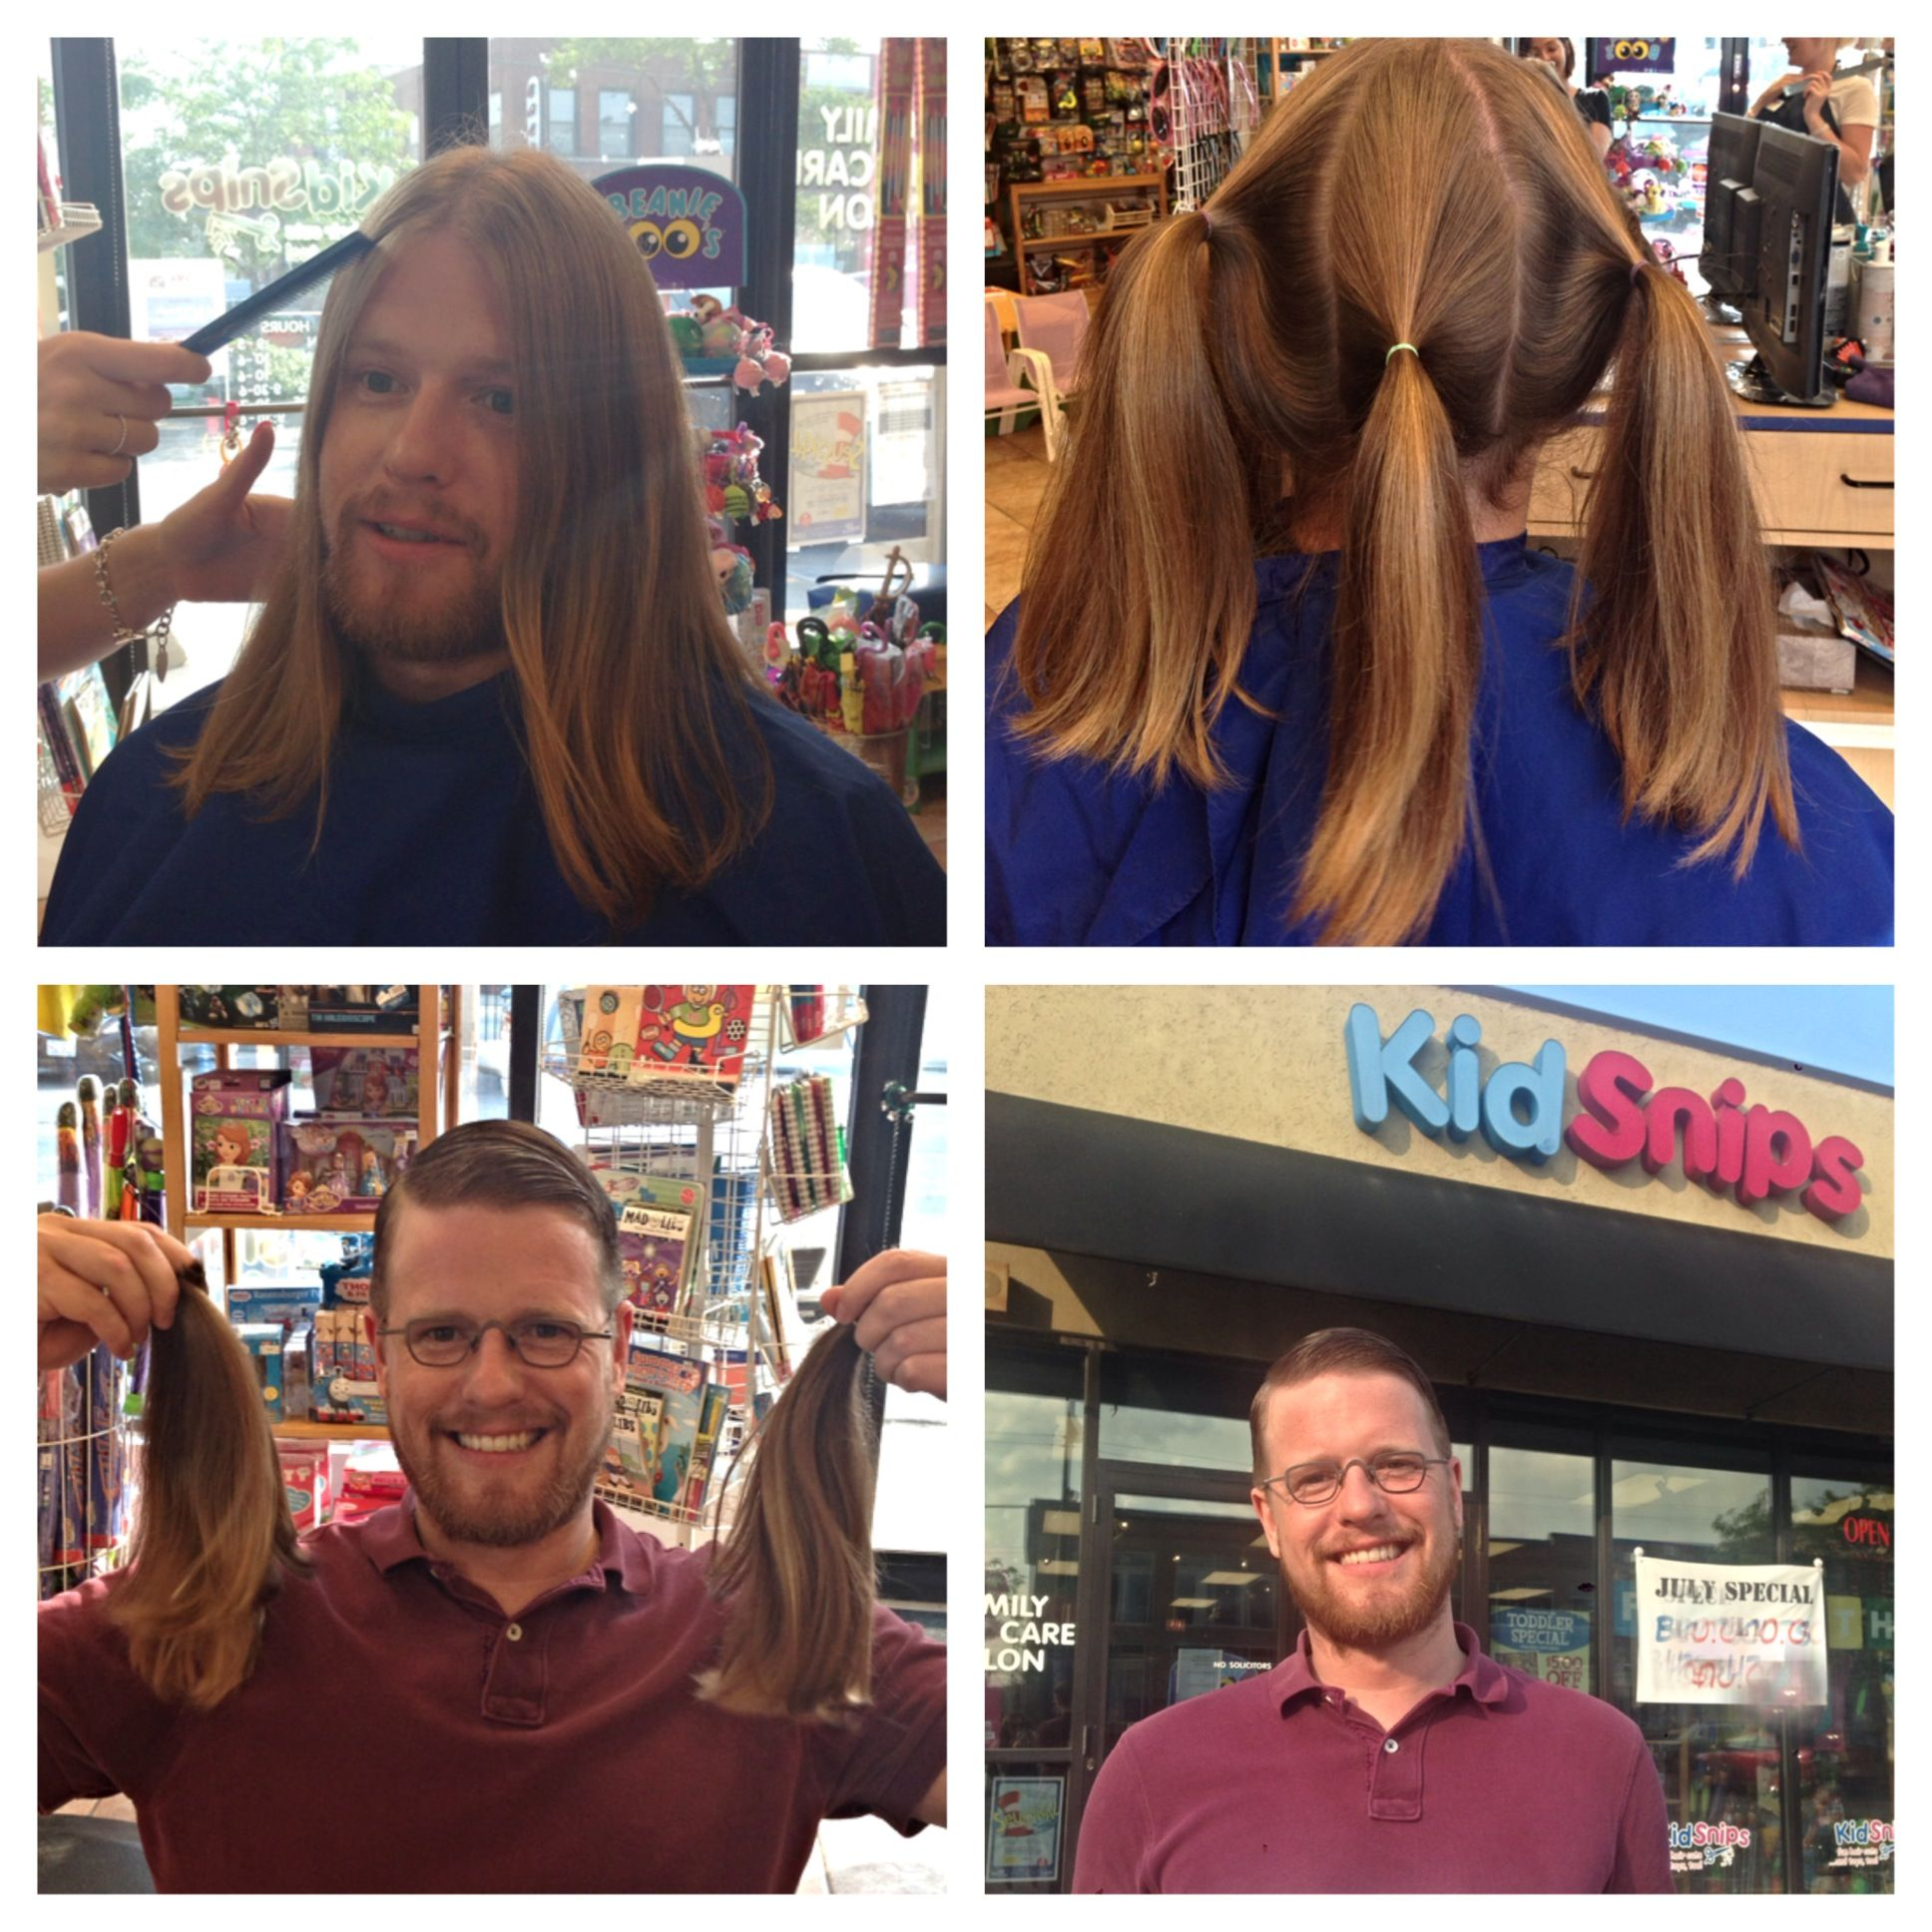 Pin On Kidsnips Haircuts For Charity